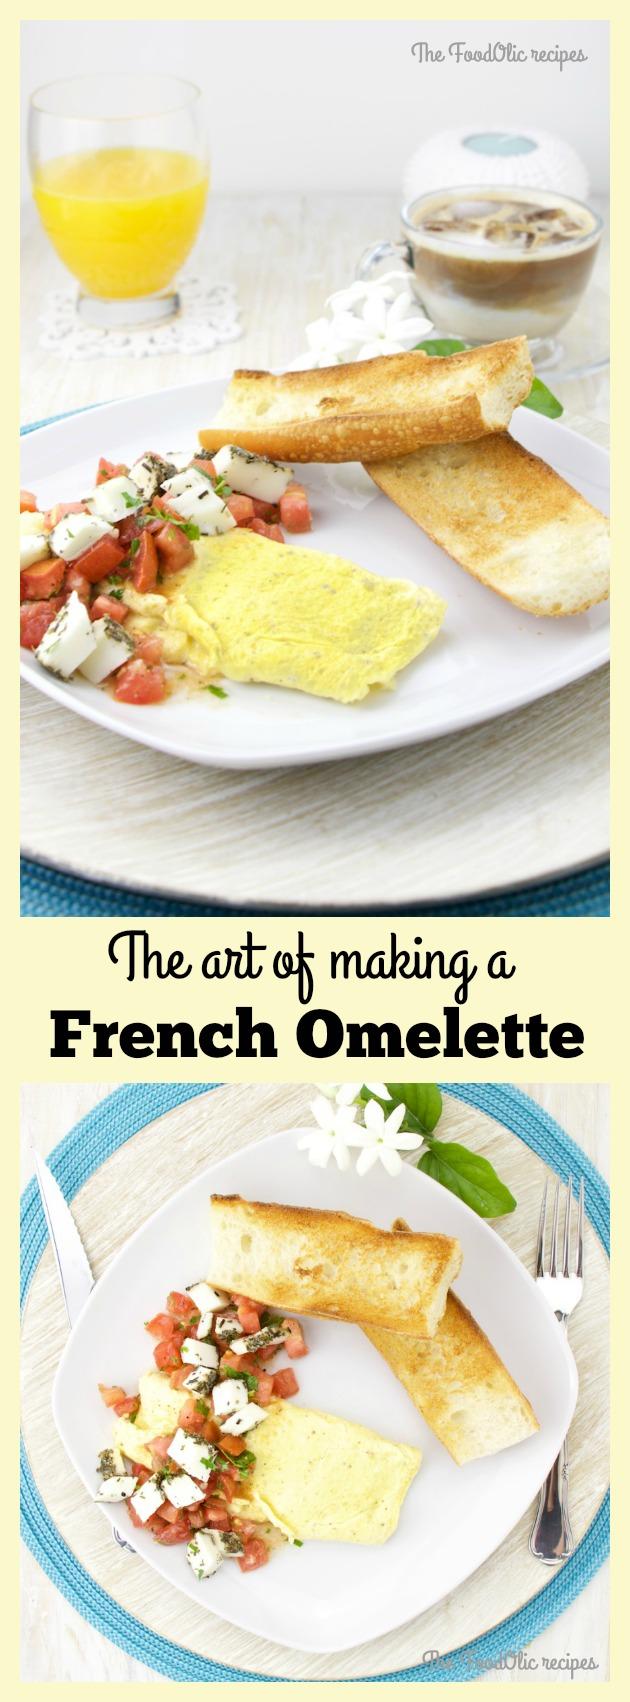 omeletpin